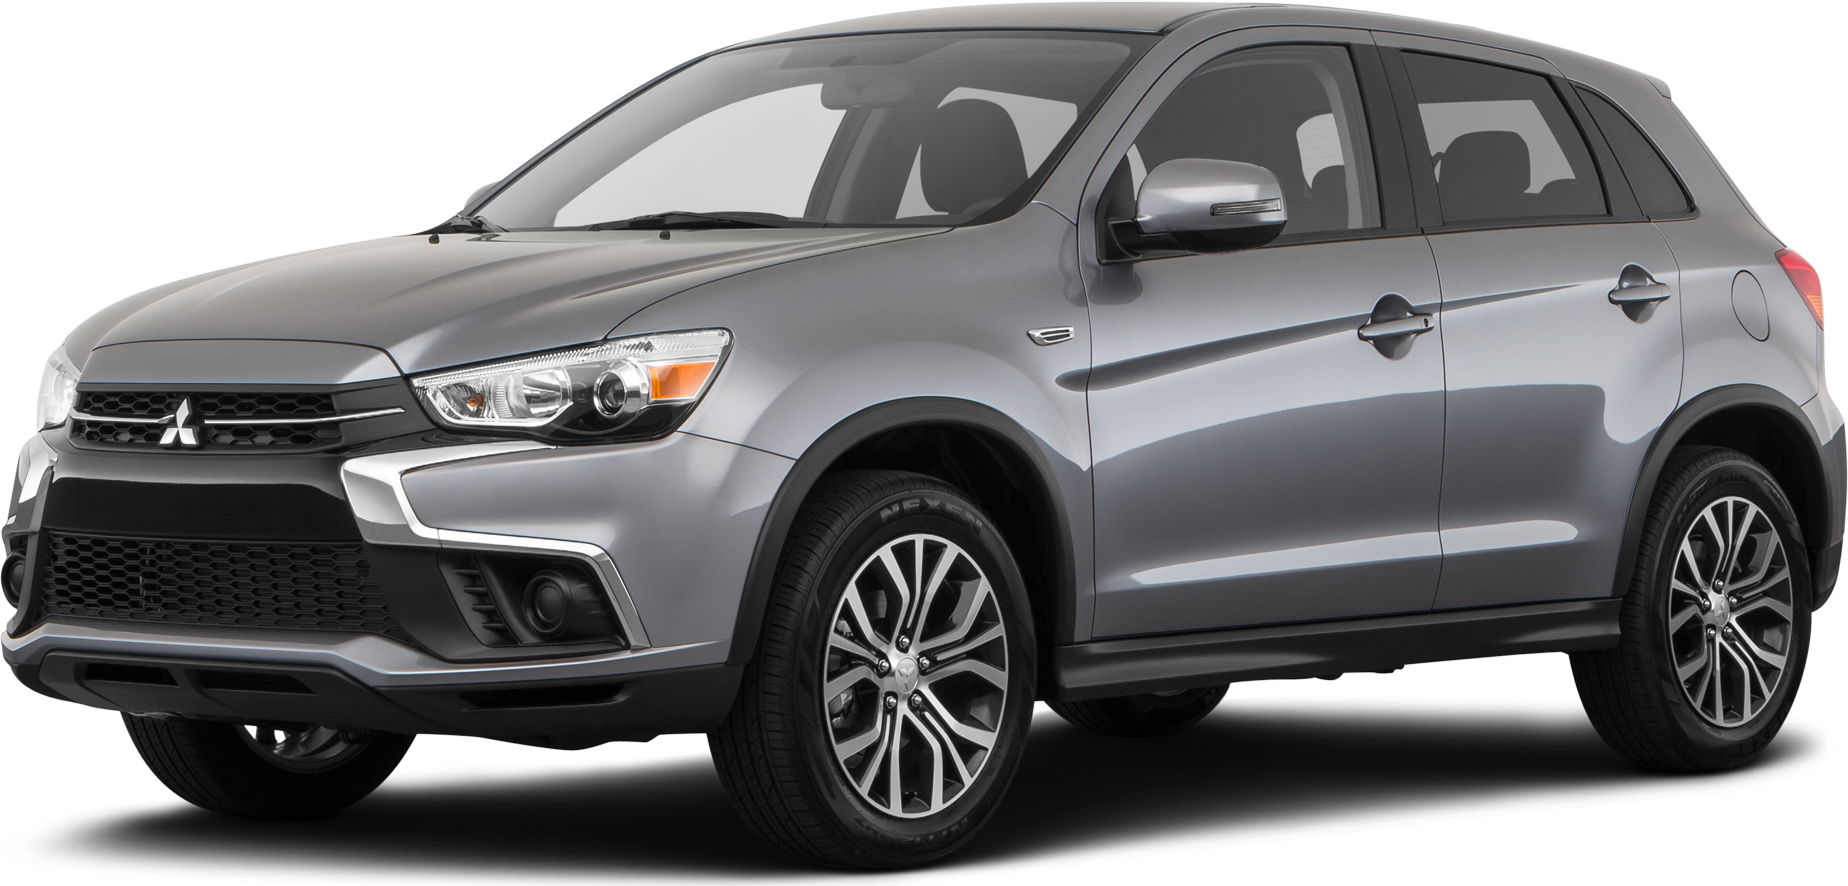 2019 Mitsubishi Outlander   Pricing, Ratings, Expert Review